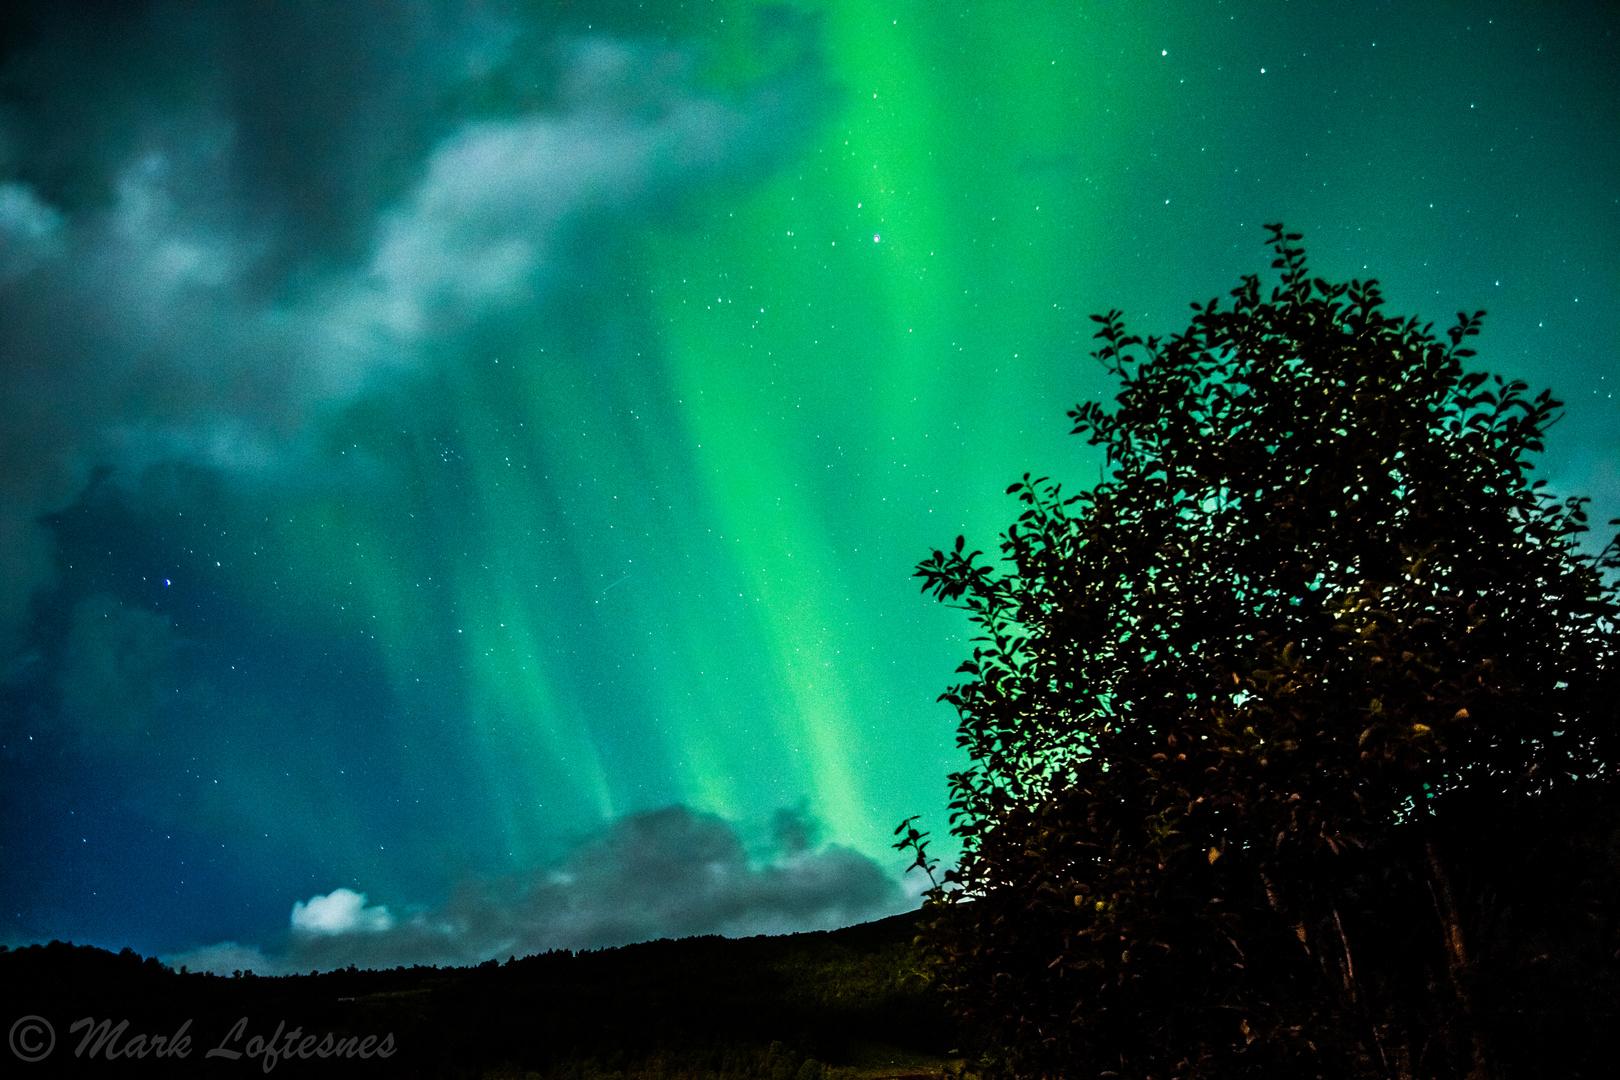 Northern lights over tree